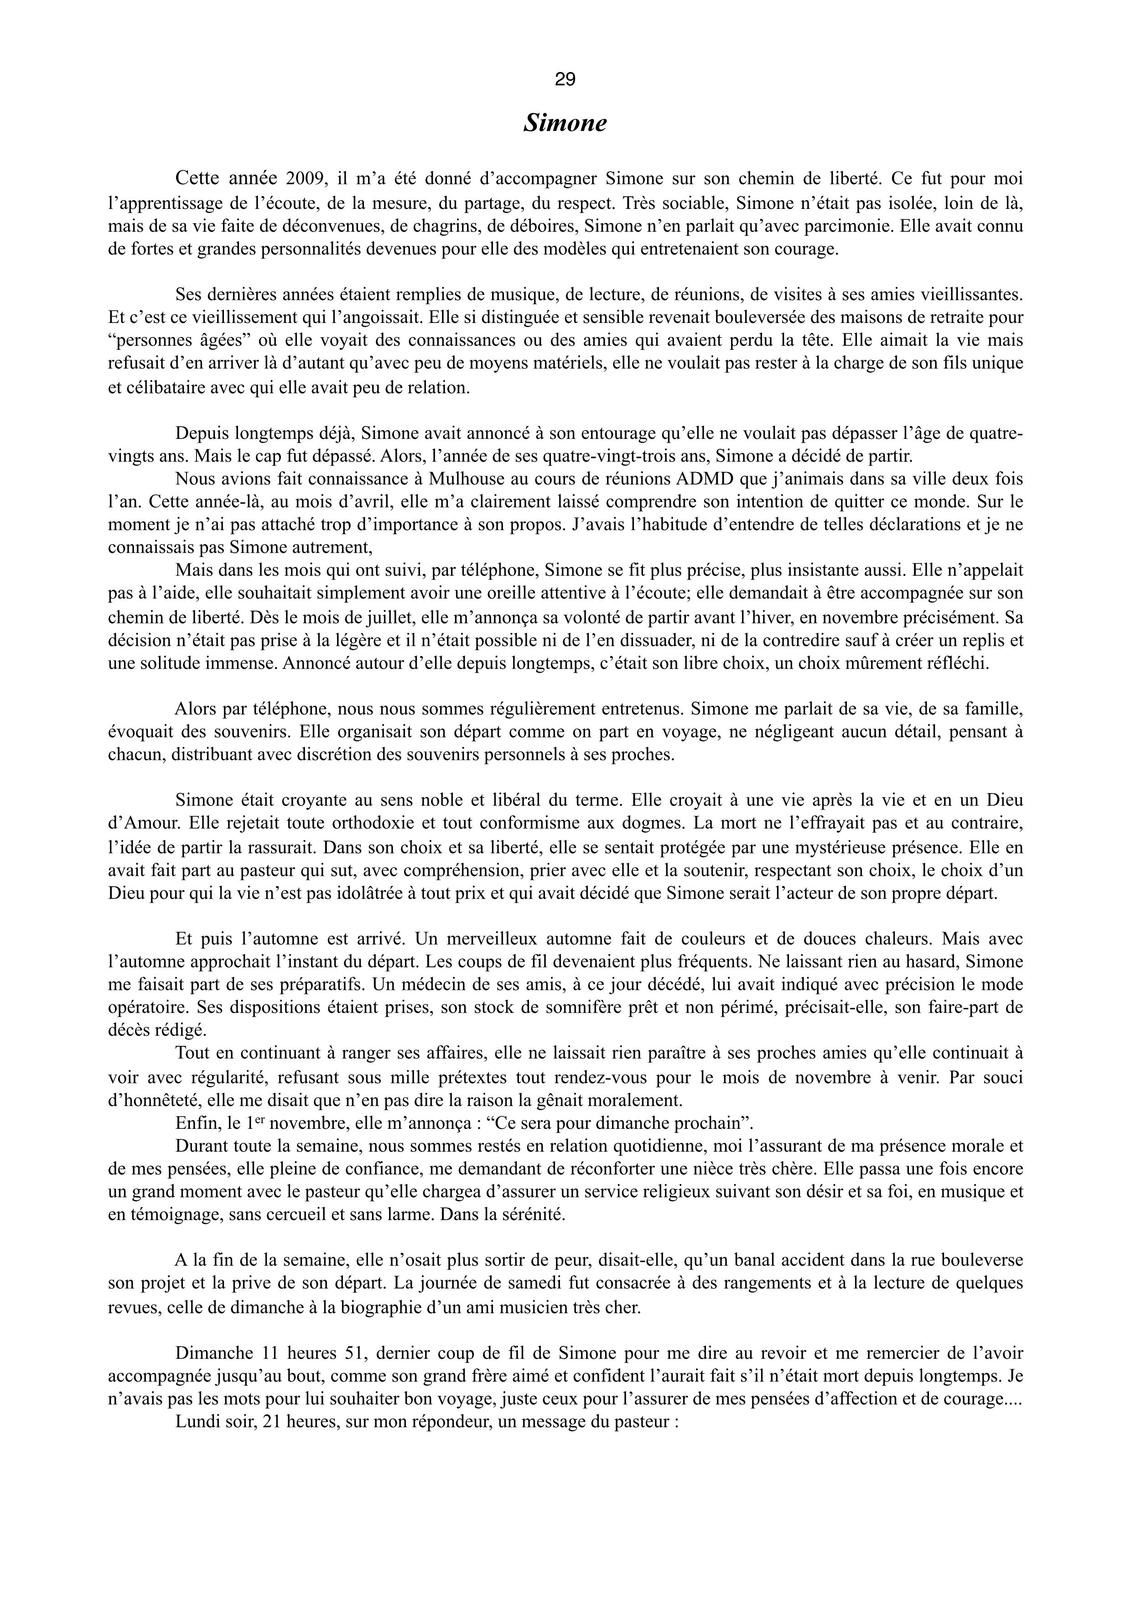 Jean-Daniel NESSMANN son temoignage ADMD années 2009 - 2010